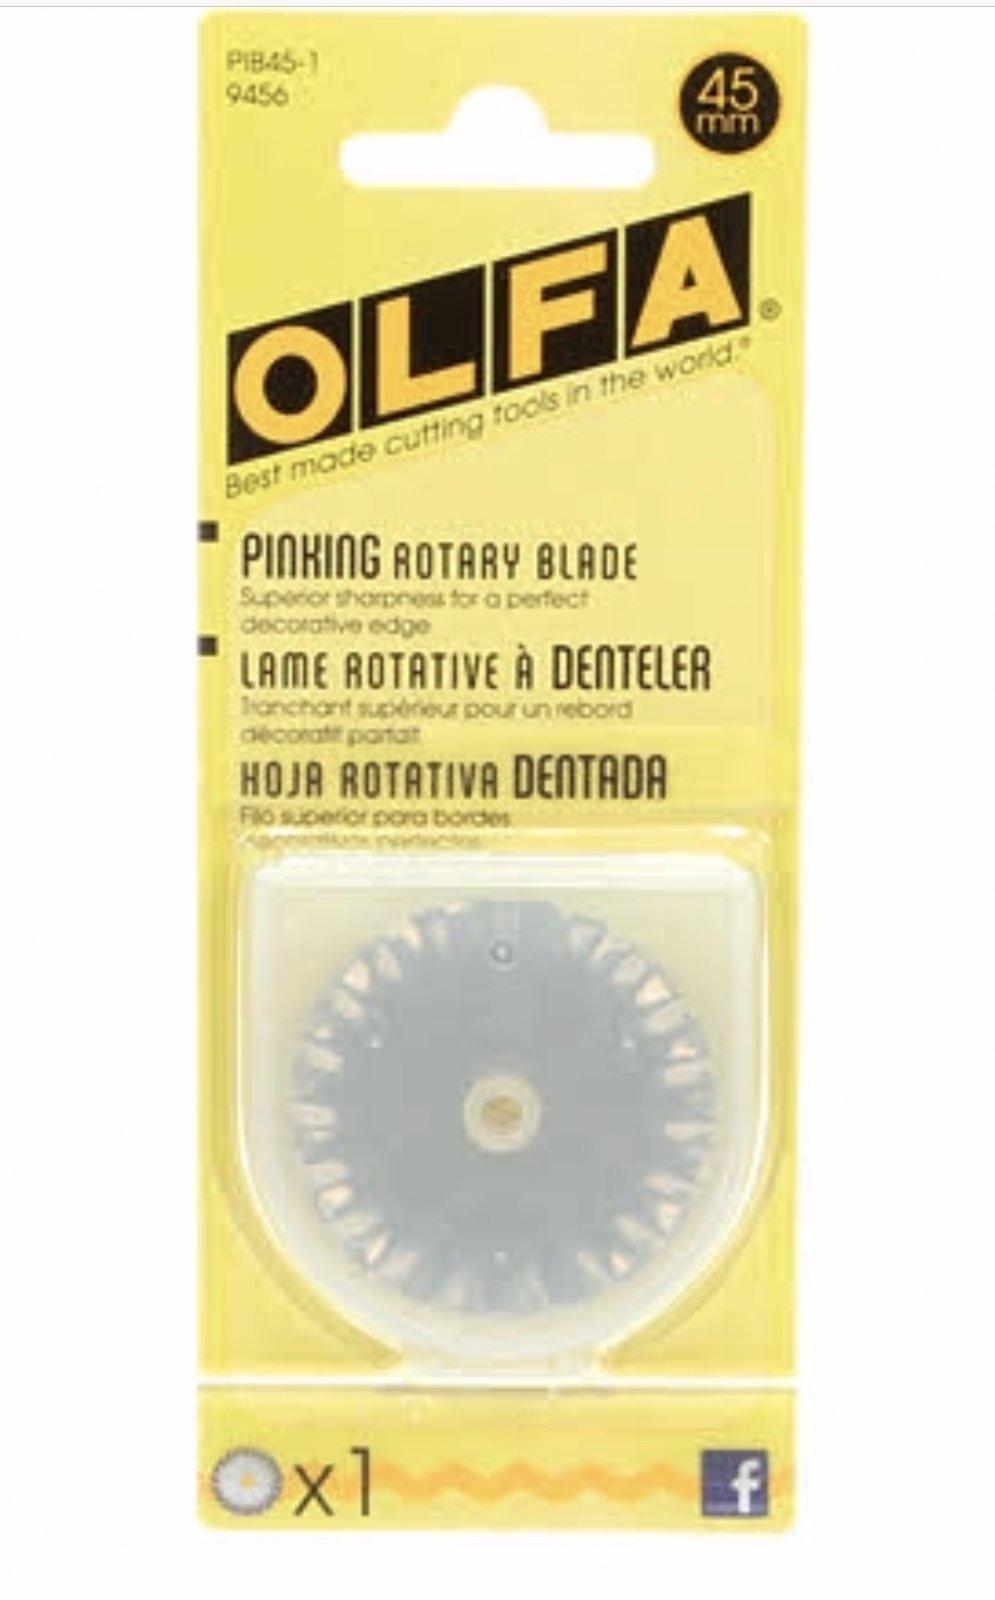 Olfa 45 mm Pinking Rotary Blade